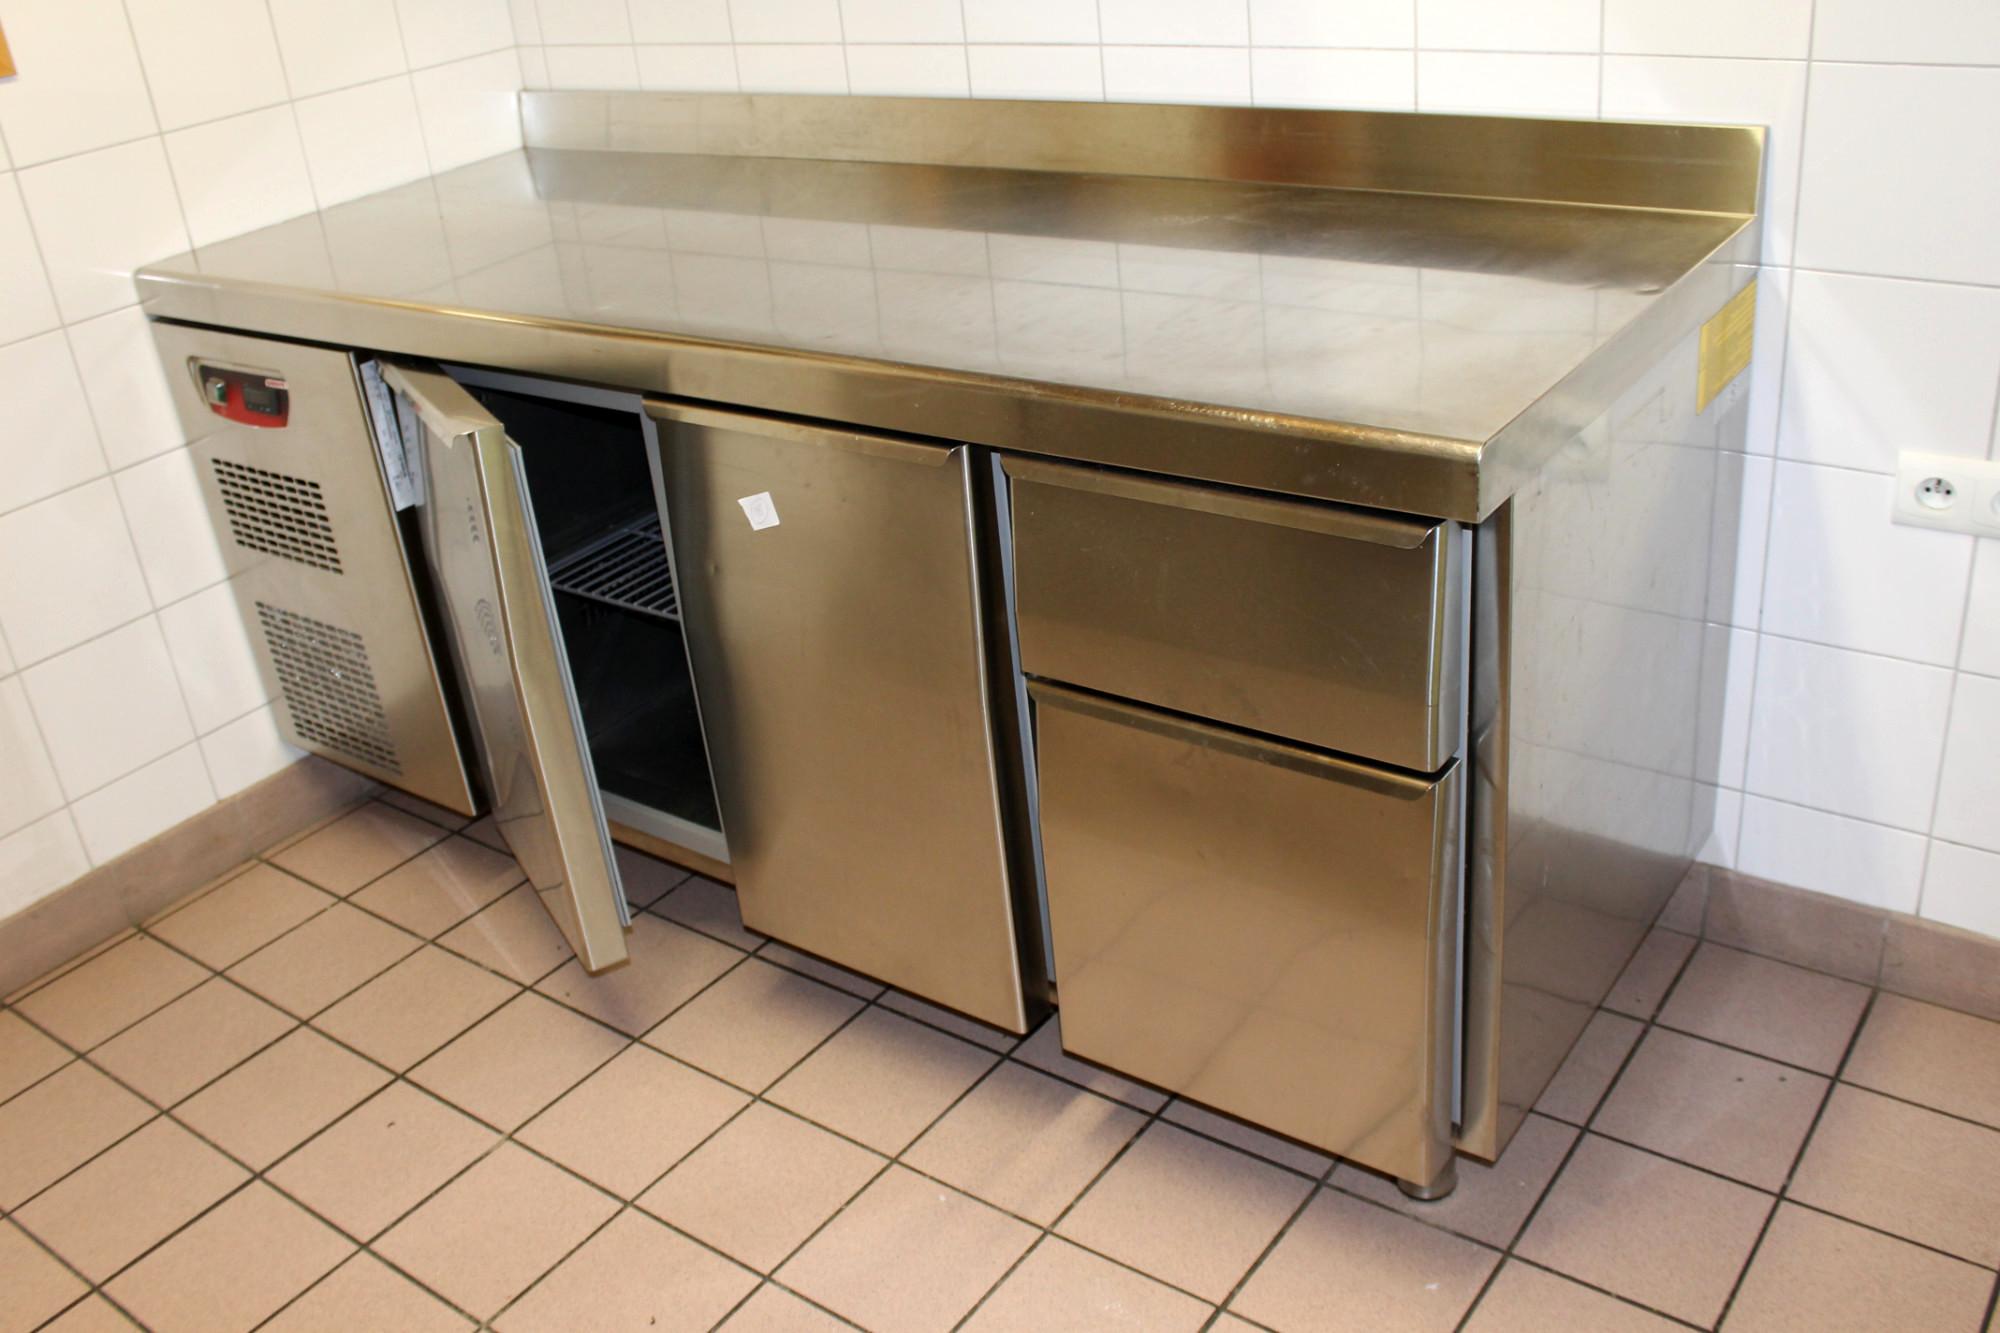 Desserte refrigeree equipement de cuisine d 39 occasion aux for Equipement de cuisine commercial